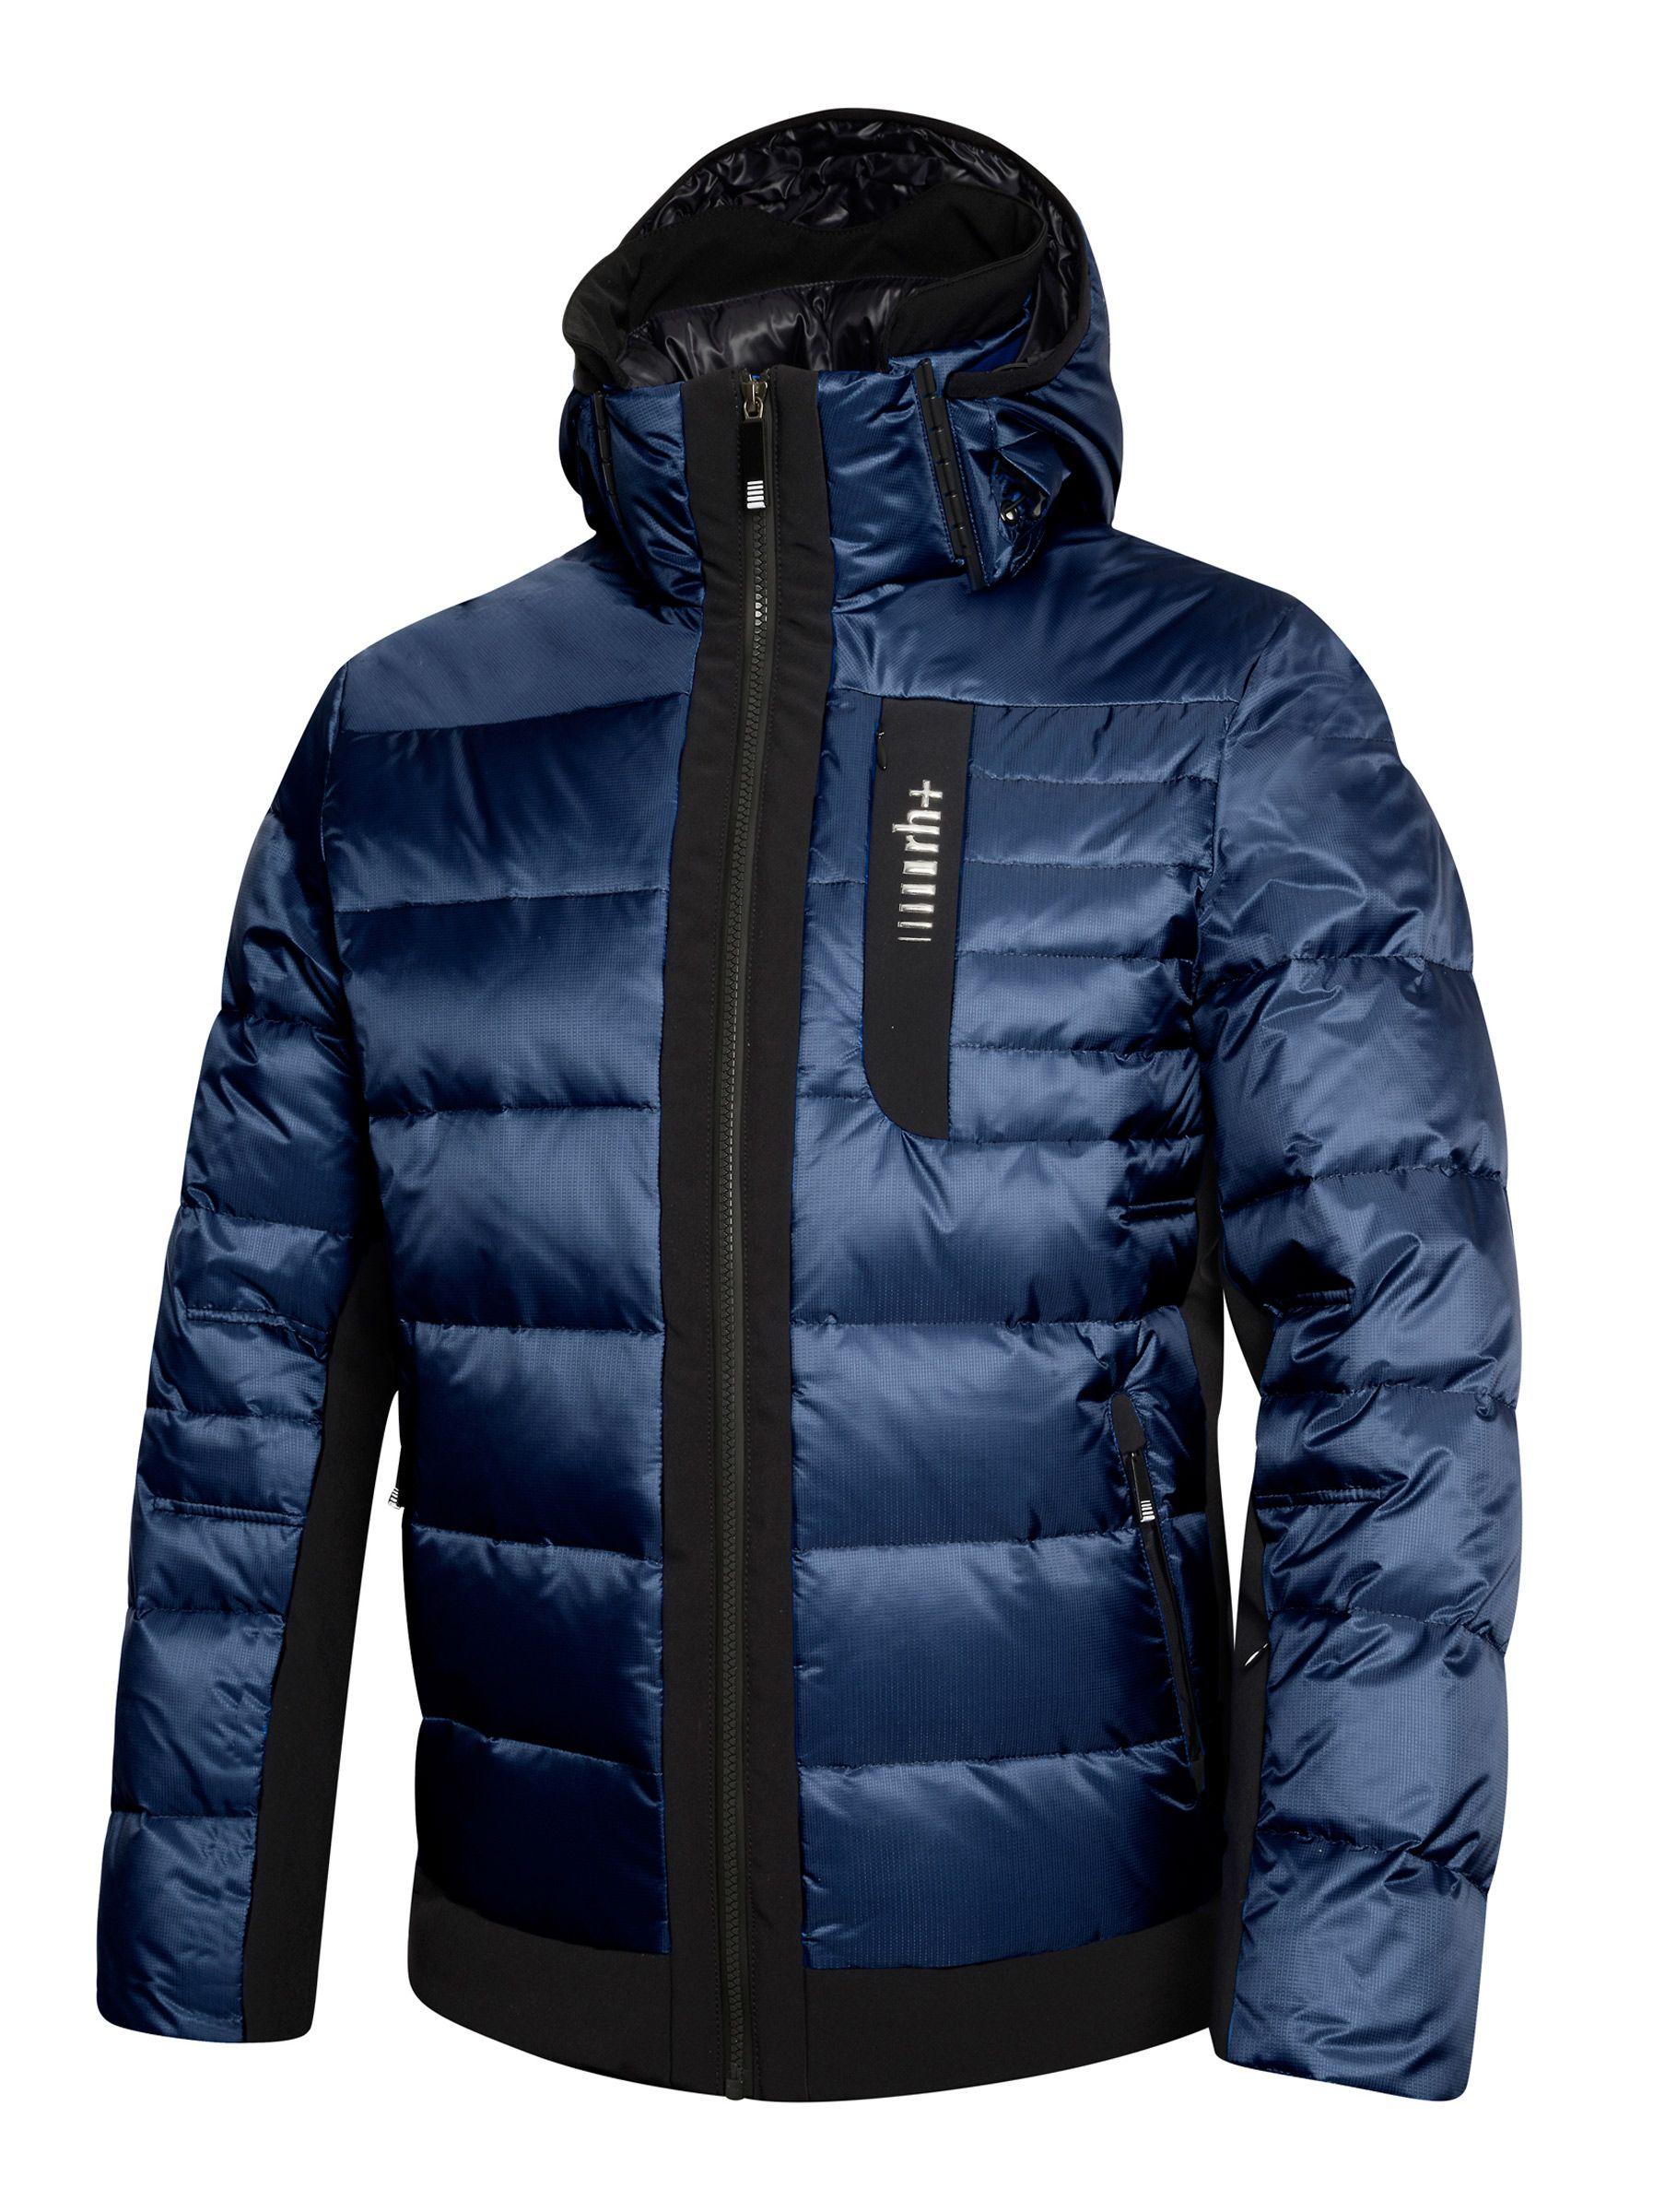 Navy Insulated Ski Jacket With 100 Down Insulation Versatile Multipurpose Men S Ski Jacket For Athletic Ski Jacket Mens Winter Jacket Men Mens Winter Coat [ 2400 x 1794 Pixel ]